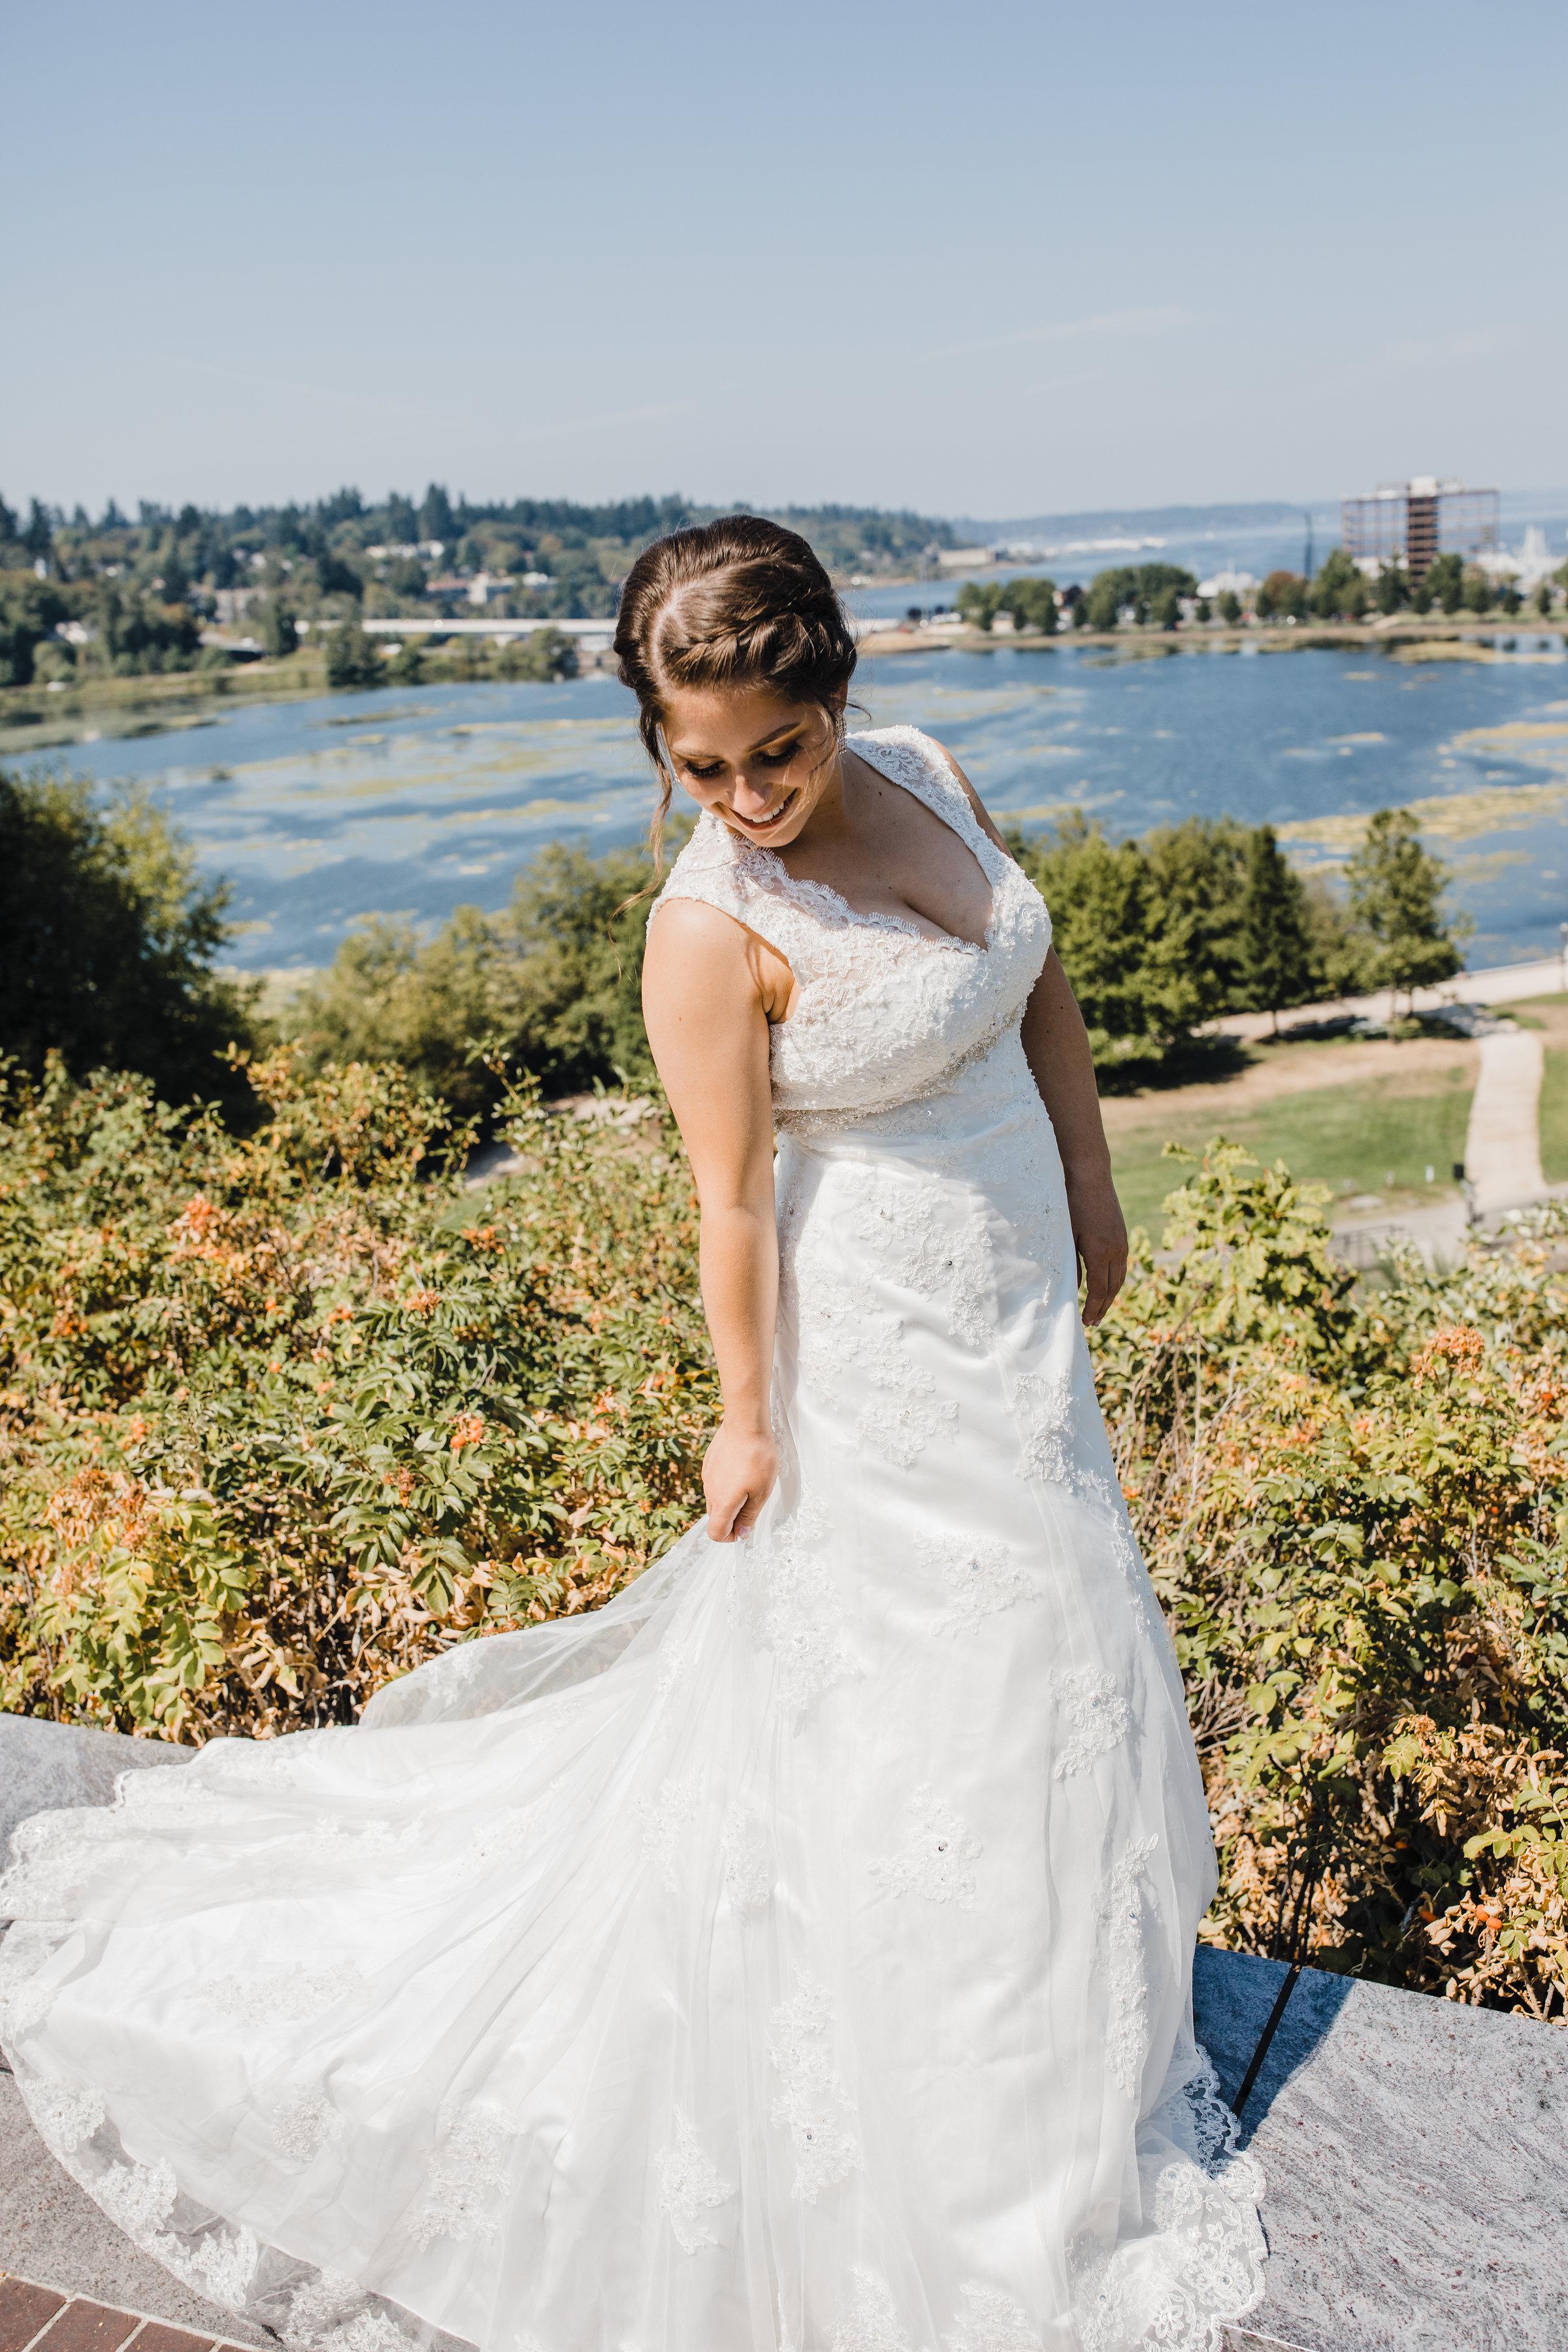 olympia washington professional wedding photographer gold course outdoor wedding long train bride